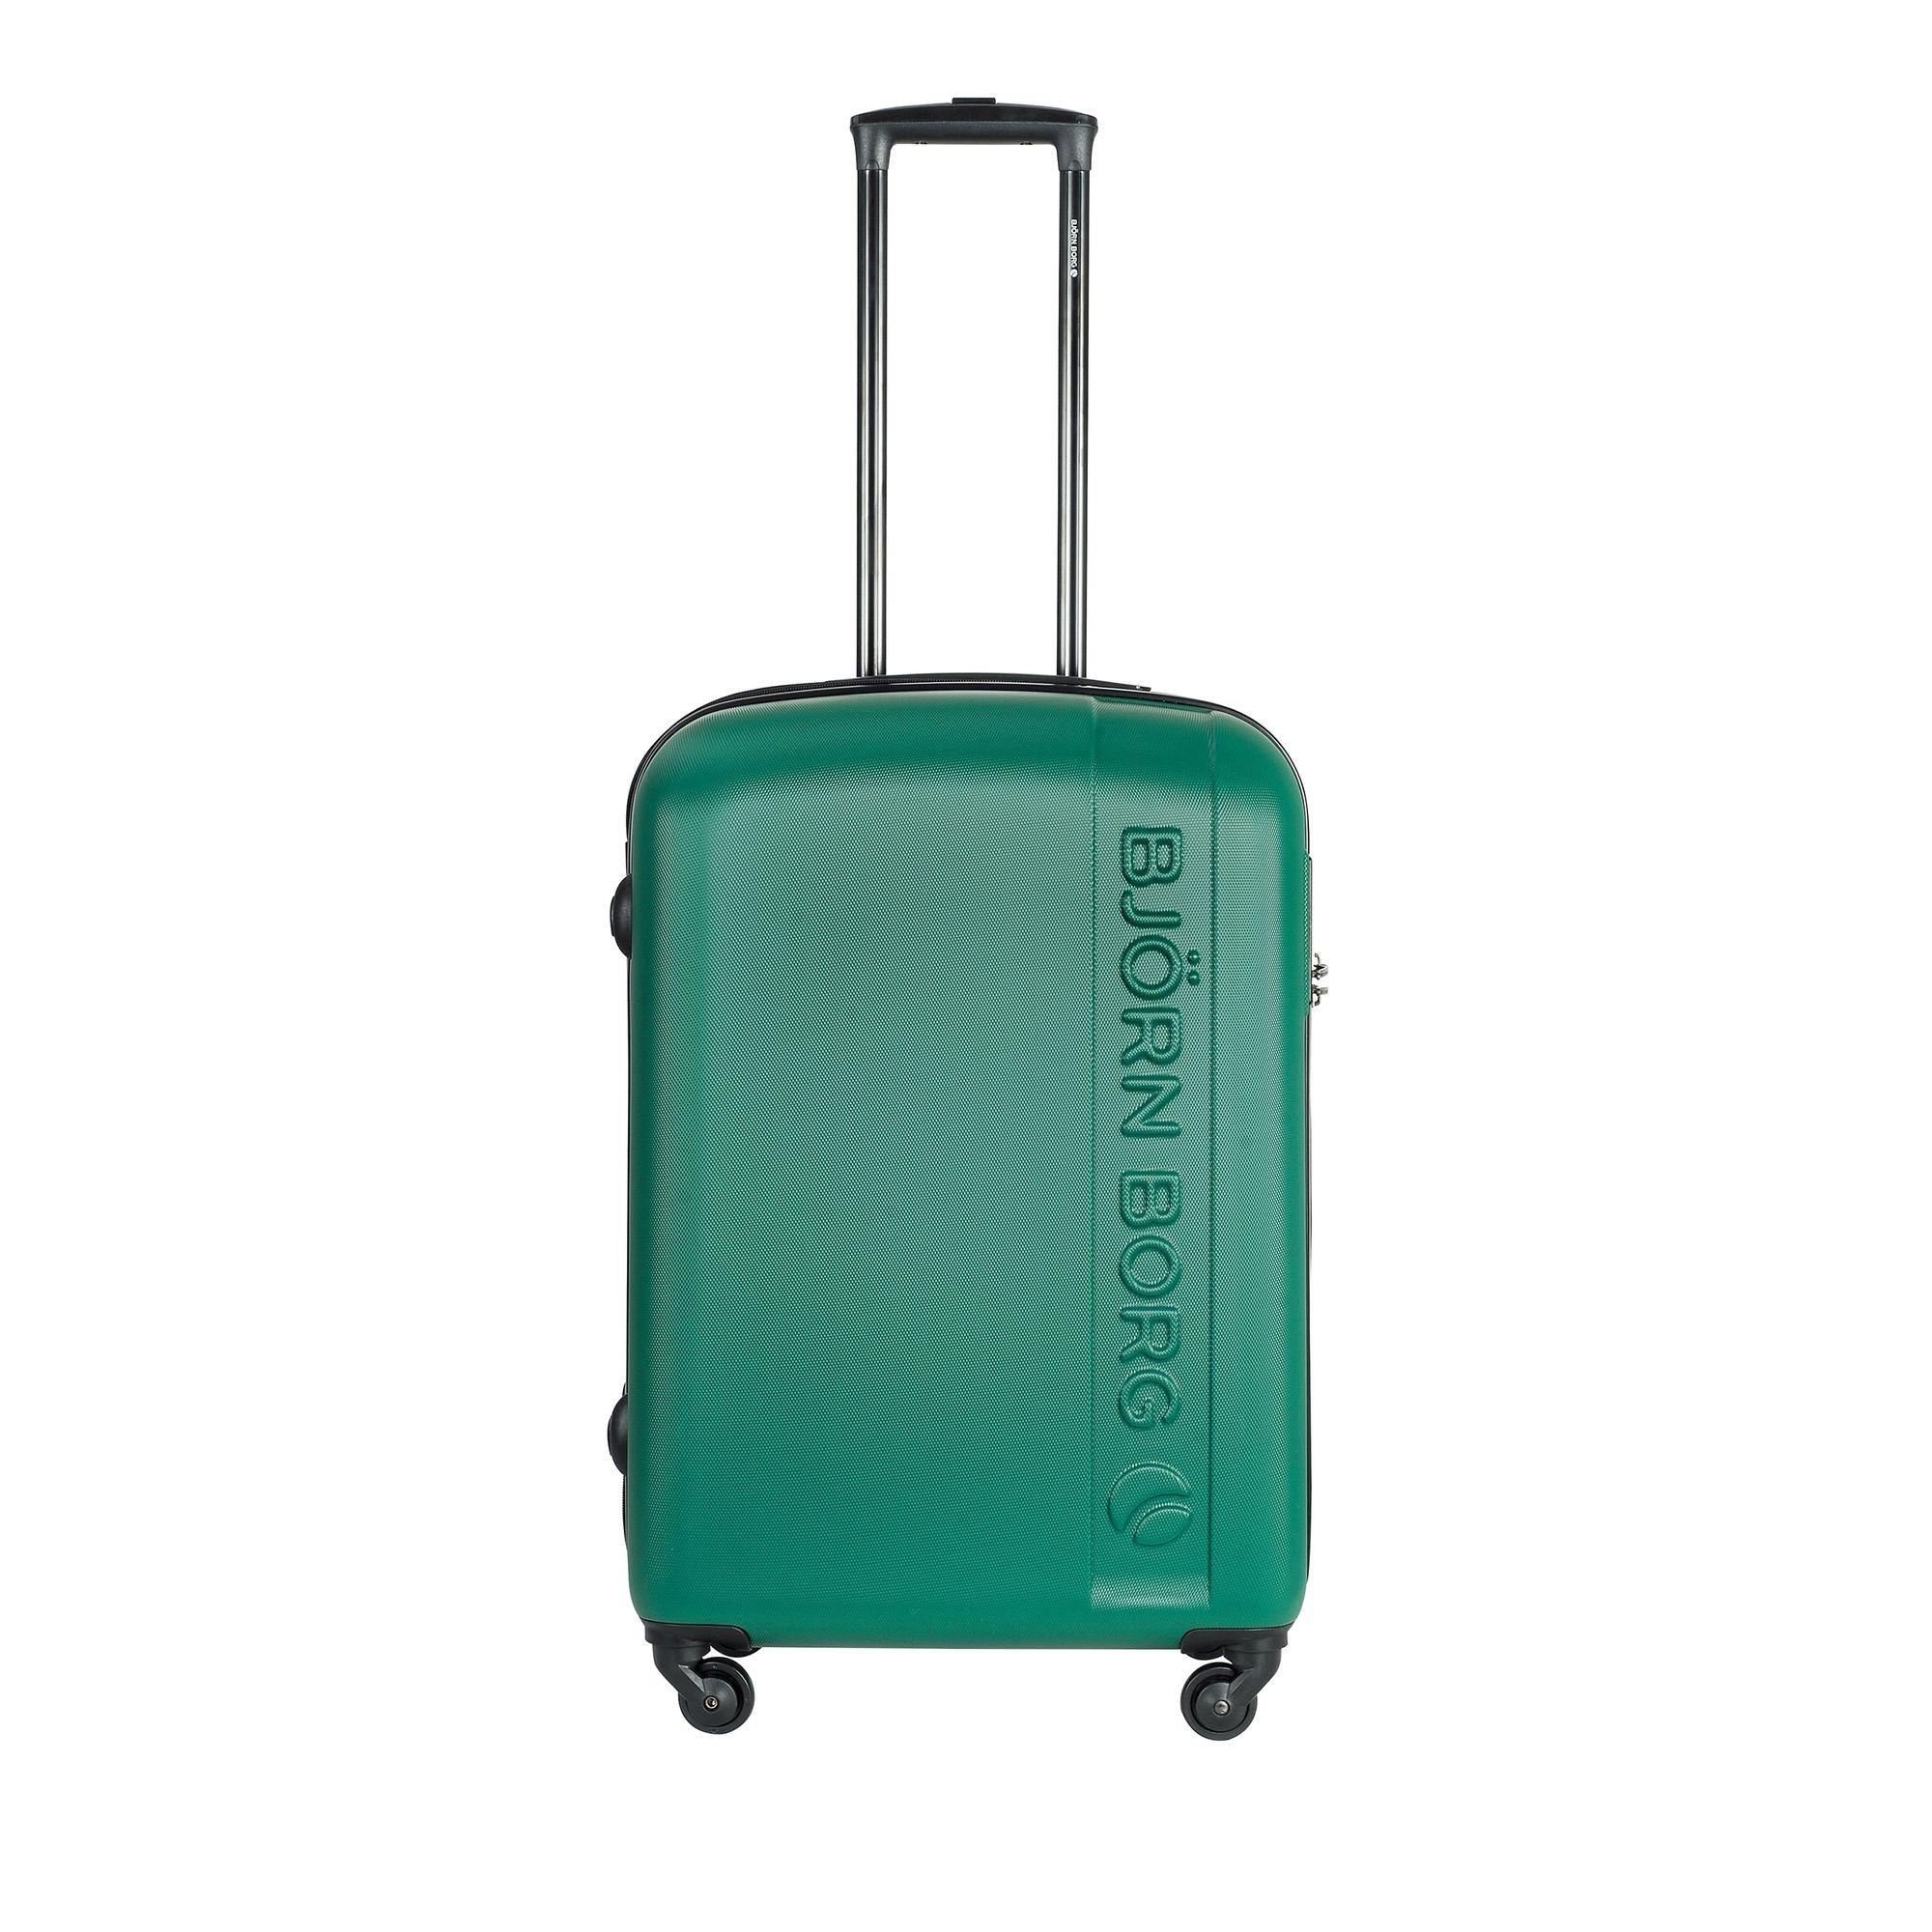 Björn Borg Hot Solid resväska, 4 hjul, 55/65/78 cm, Grön, 67cm